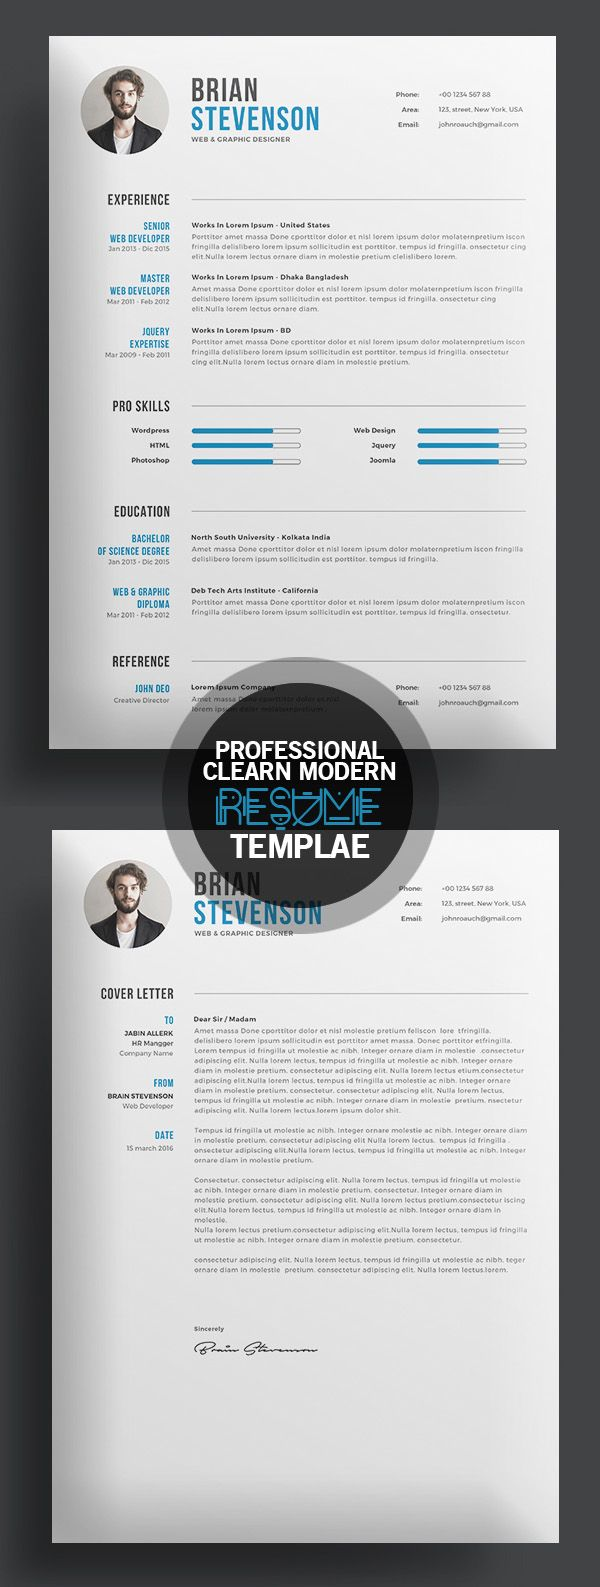 Great, clean resume design! For more resume design inspirations ...